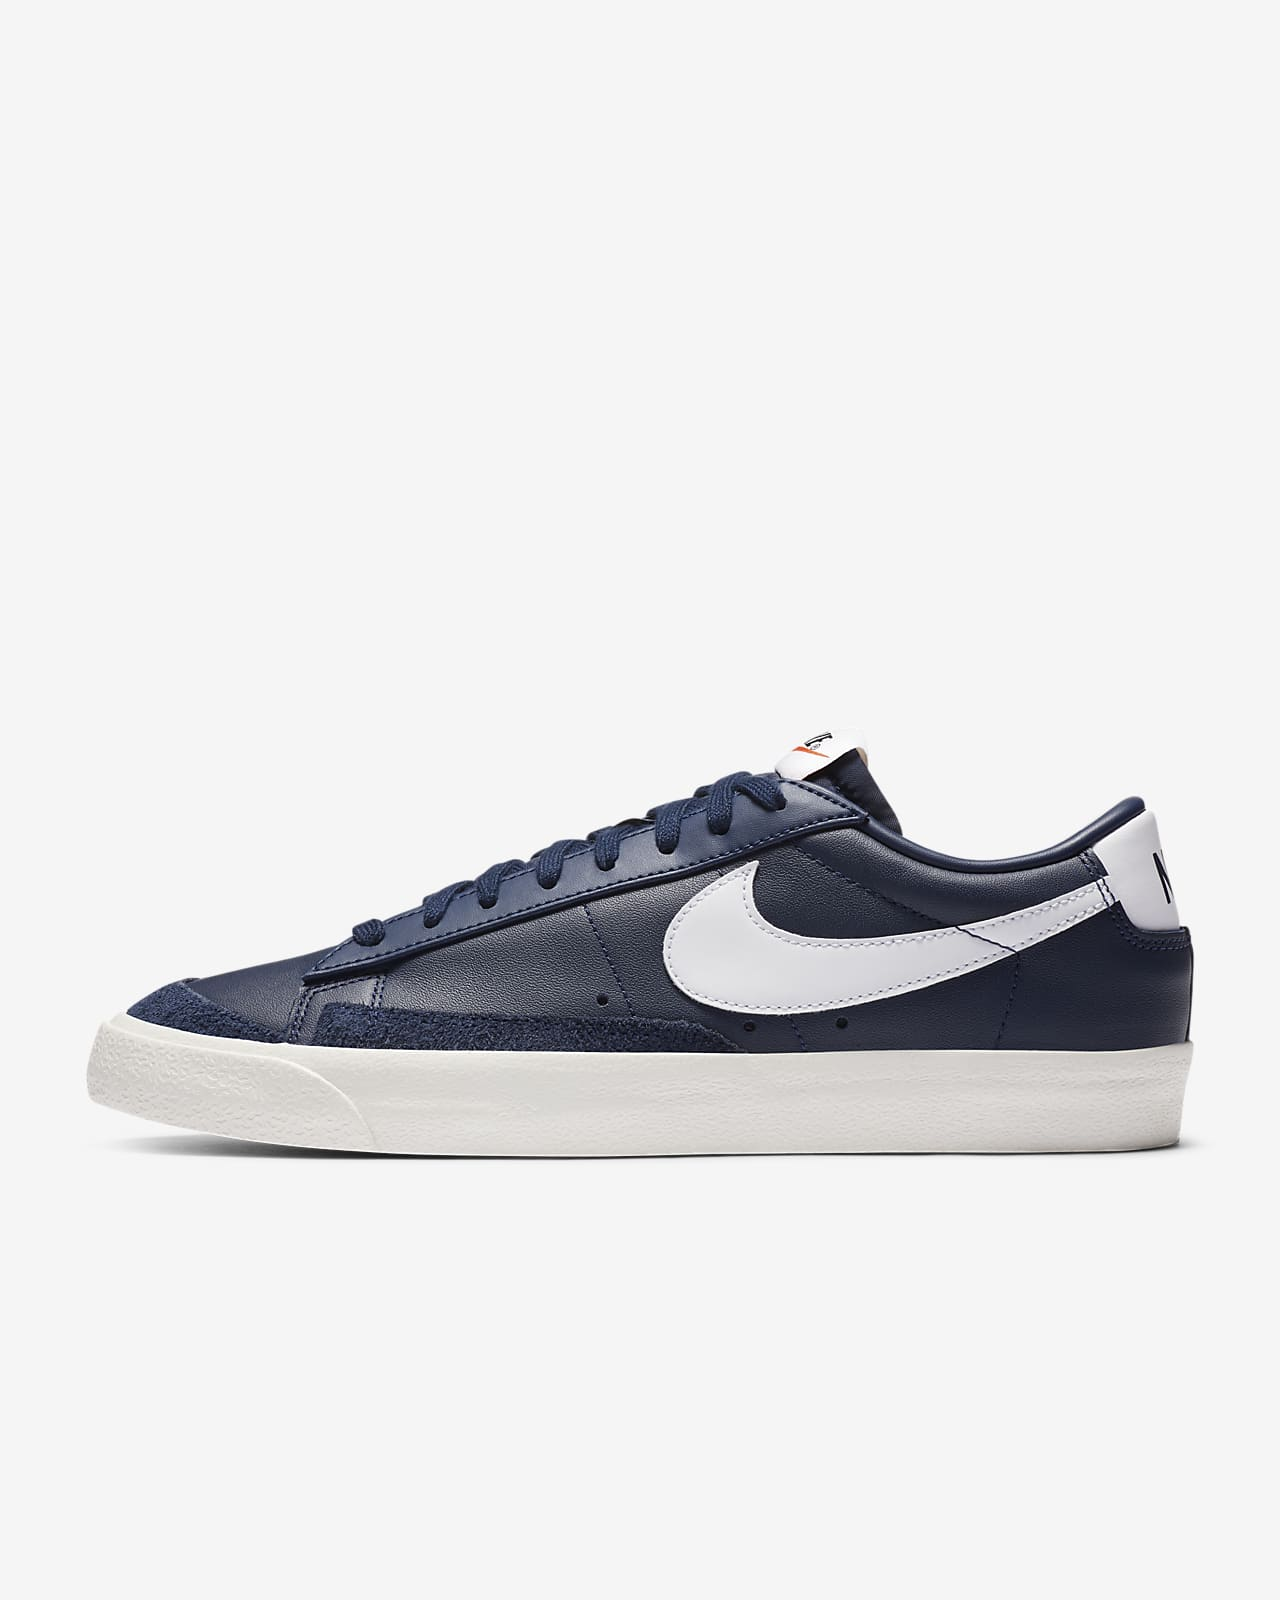 Calzado para hombre Nike Blazer Low '77 Vintage